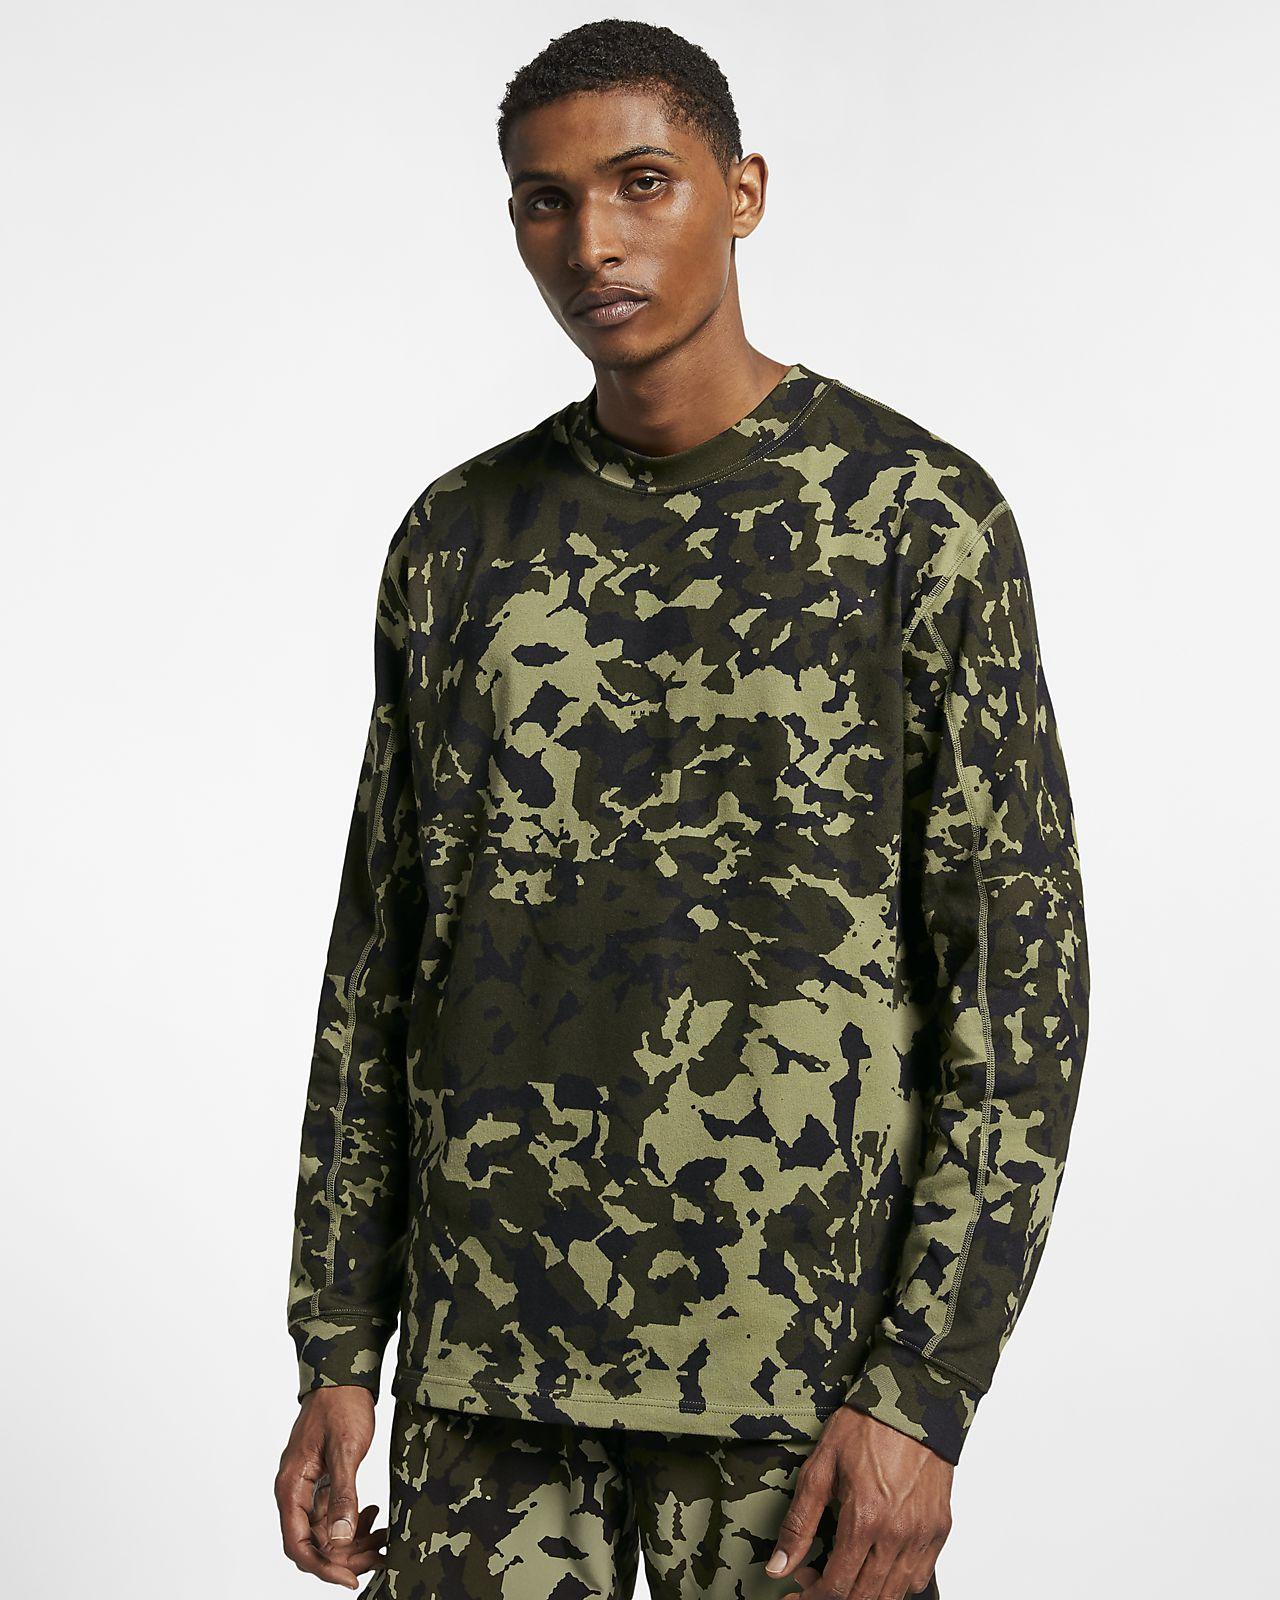 Nike x MMW 男子印花长袖上衣